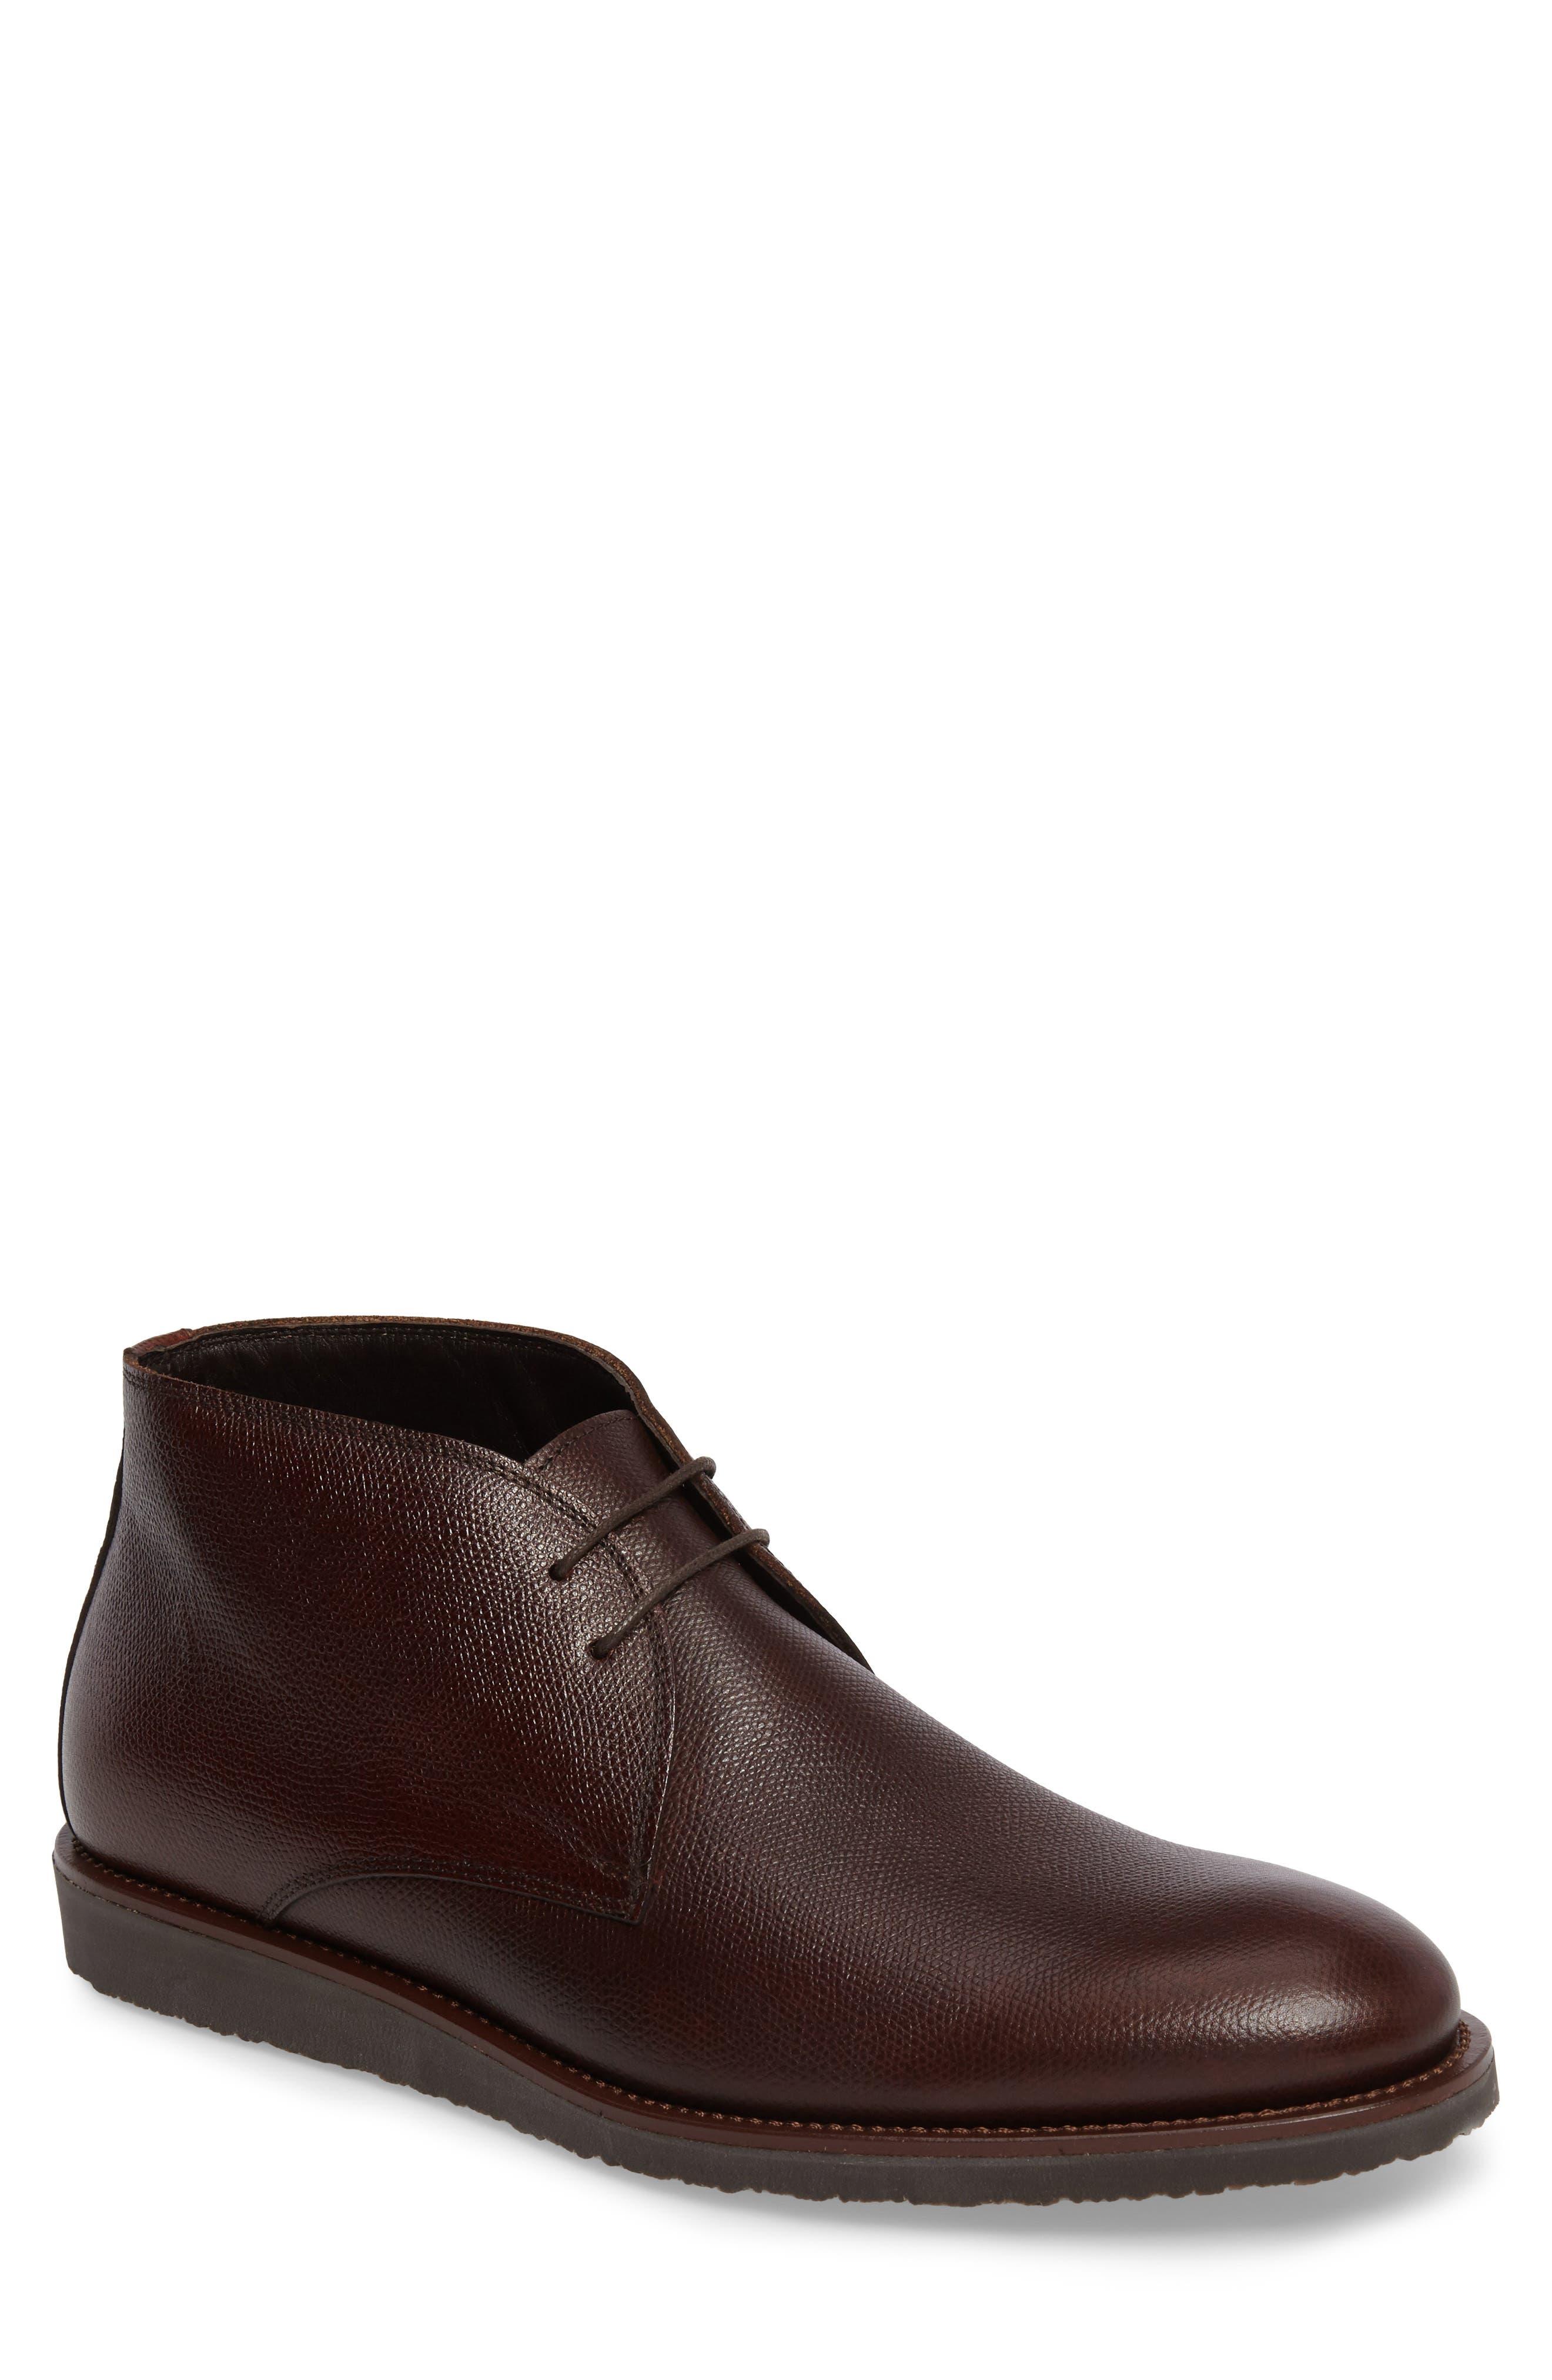 Alternate Image 1 Selected - To Boot New York Franklin Chukka Boot (Men)